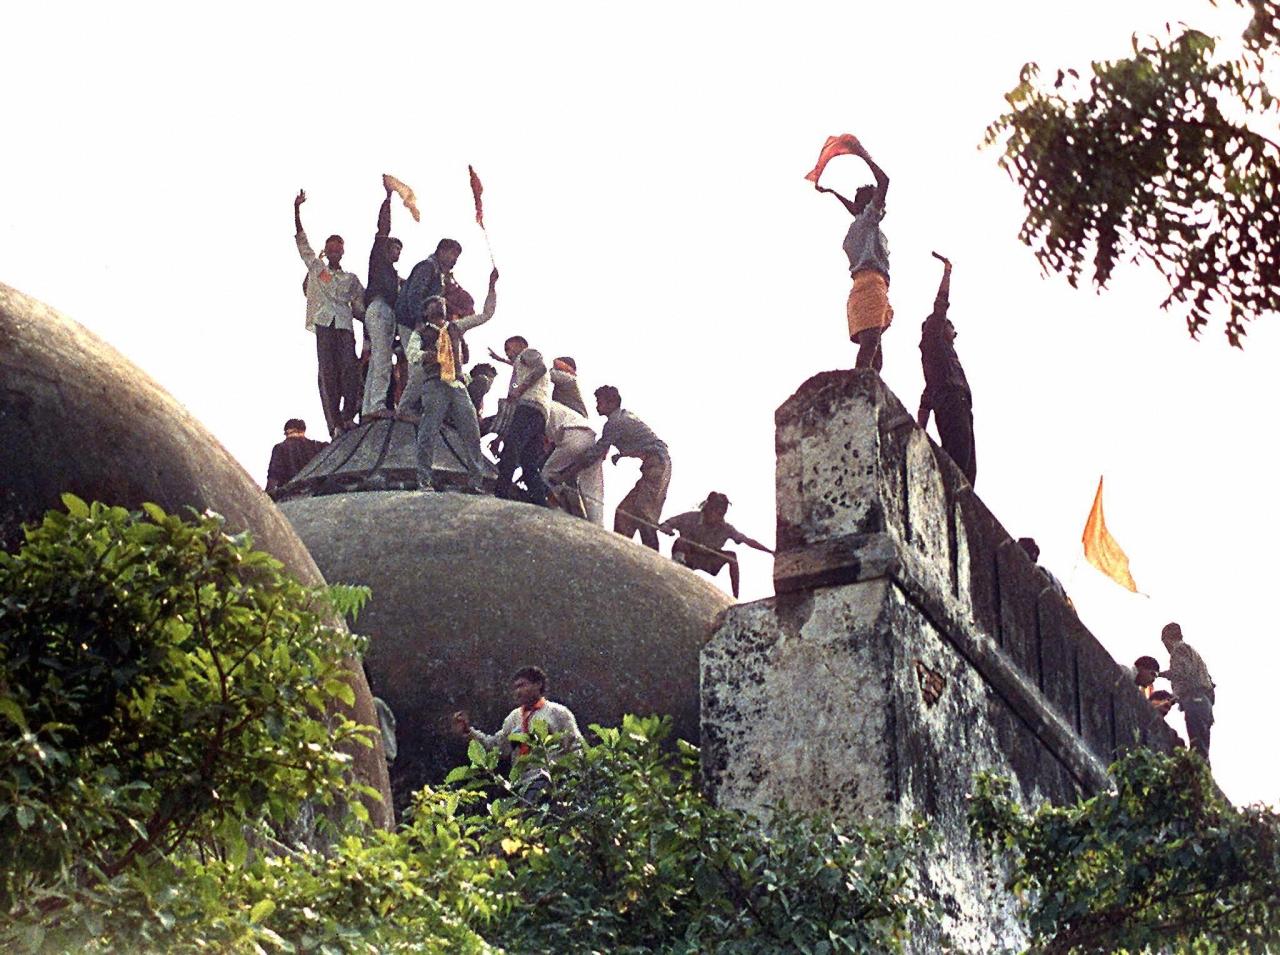 Hindu youth demolishing Babri Masjid.